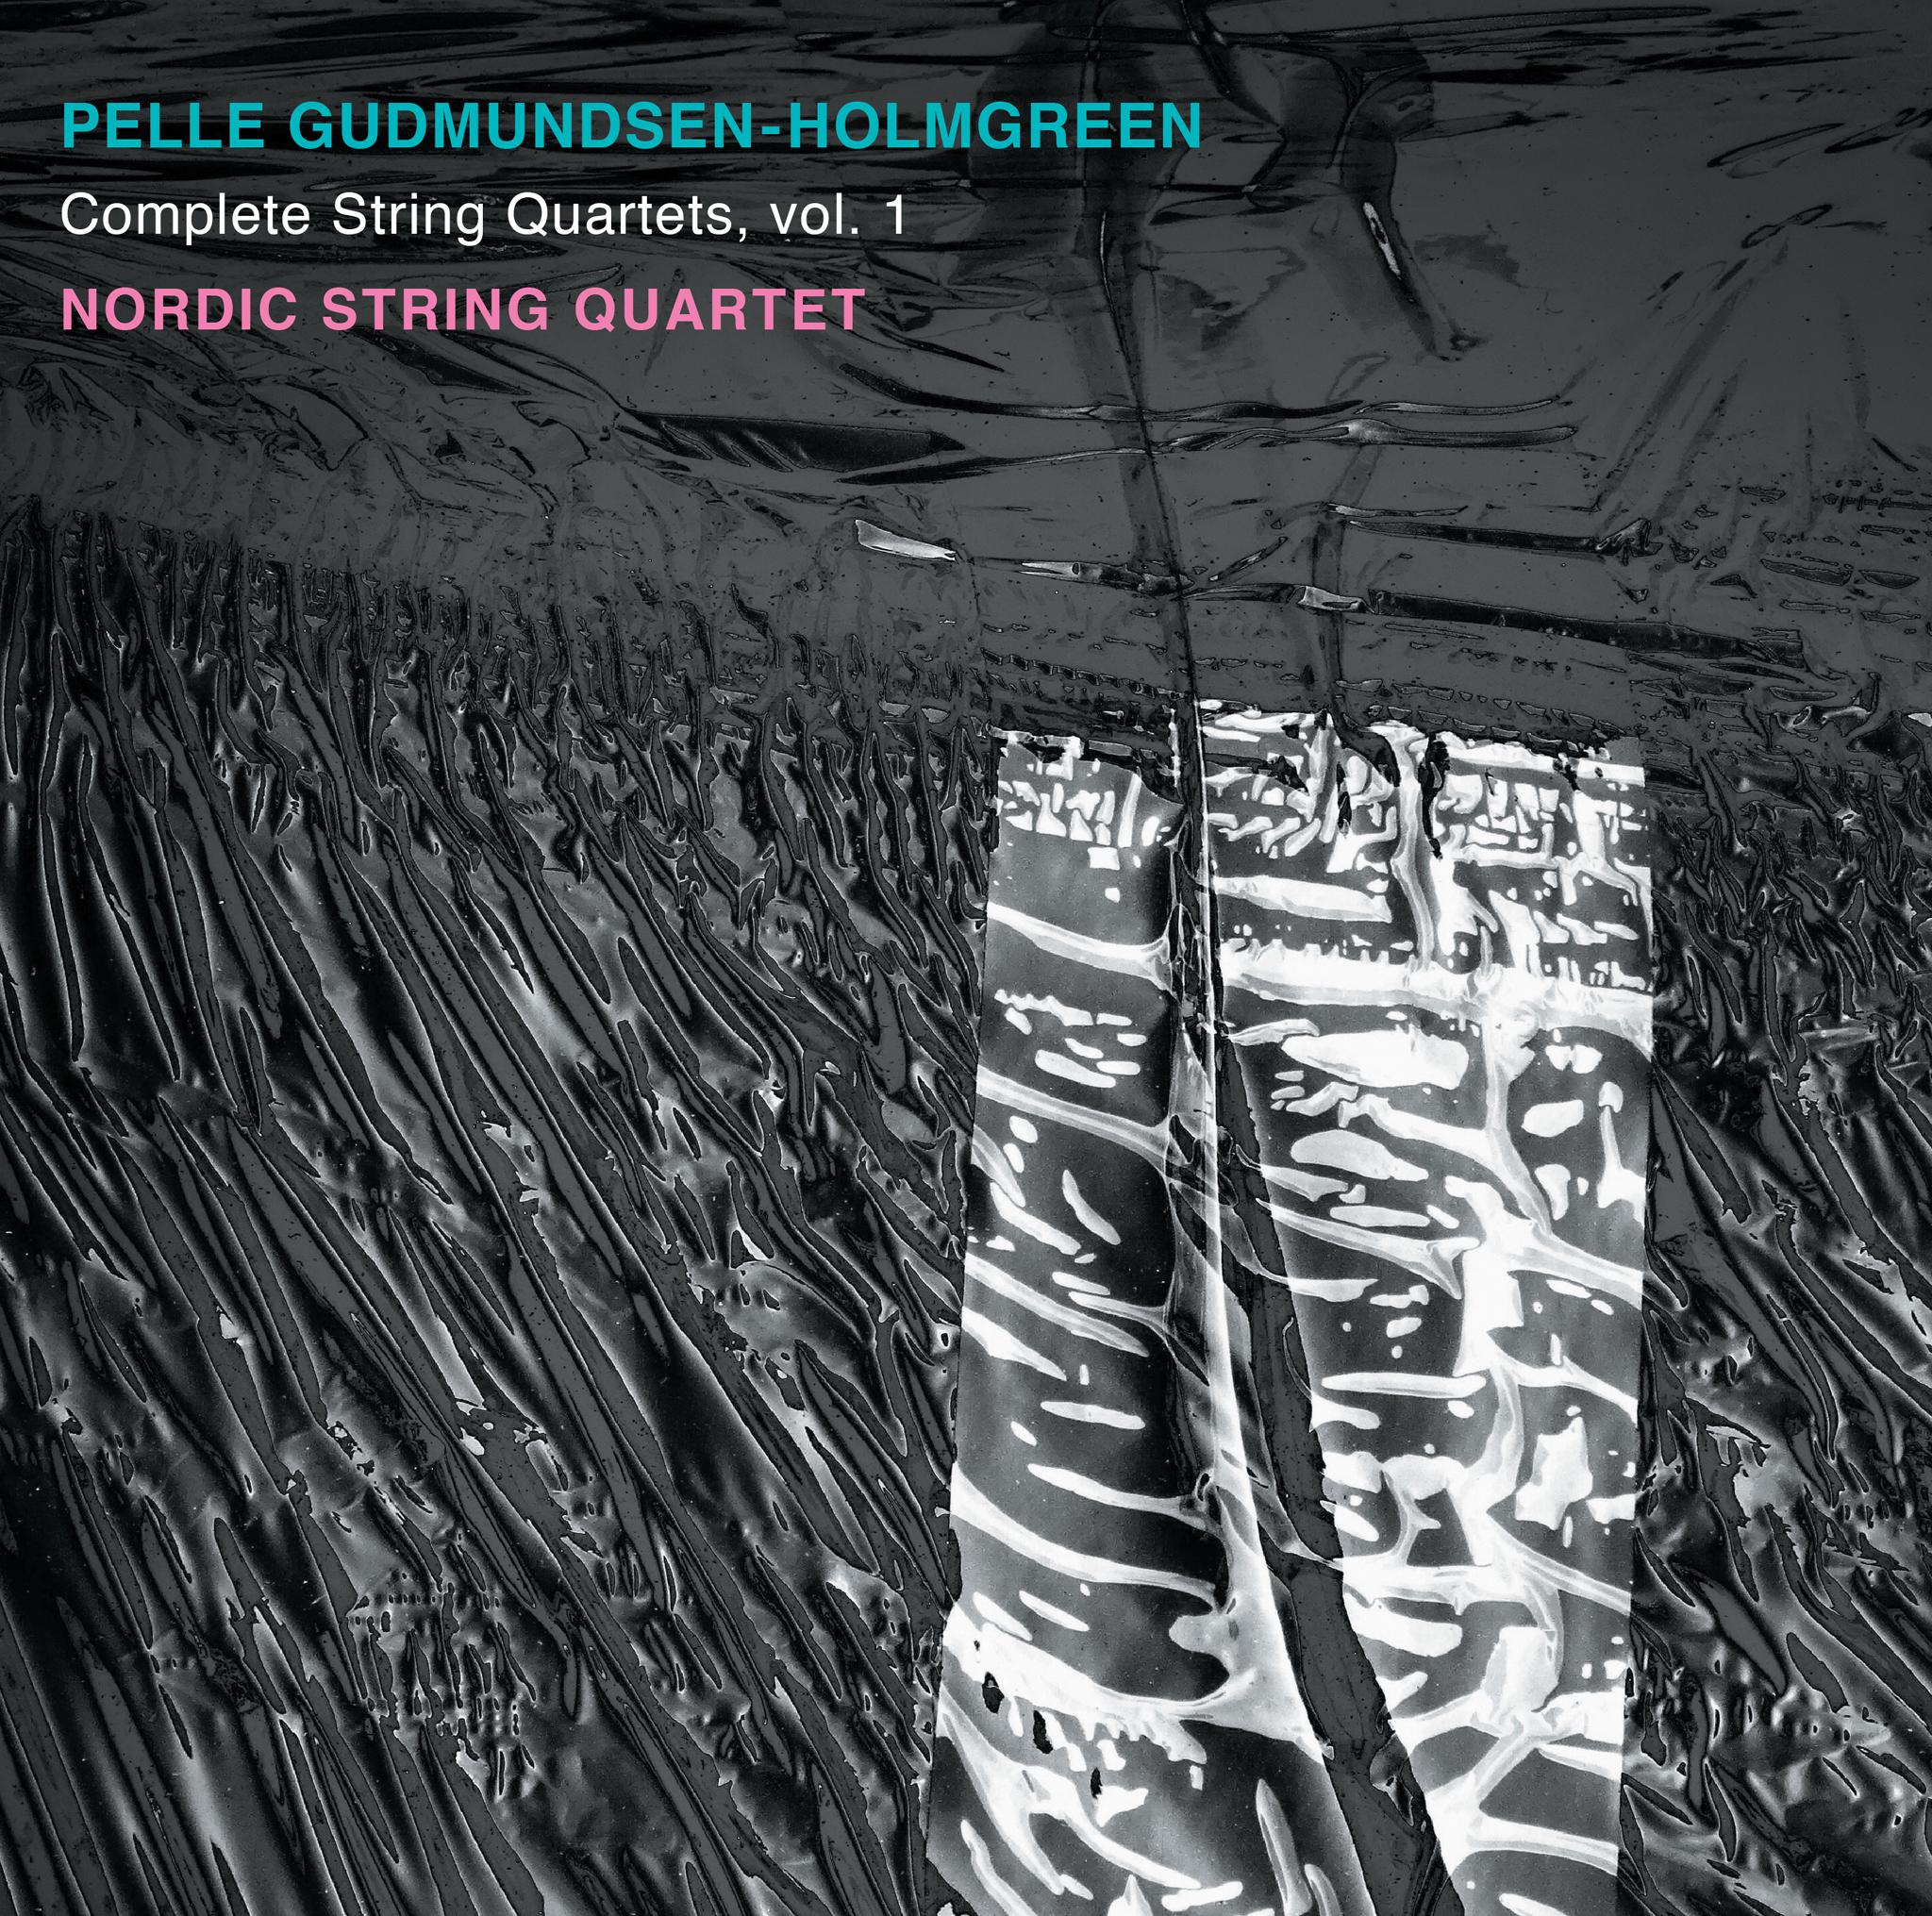 Complete String Quartets Vol  1 | Dacapo Records